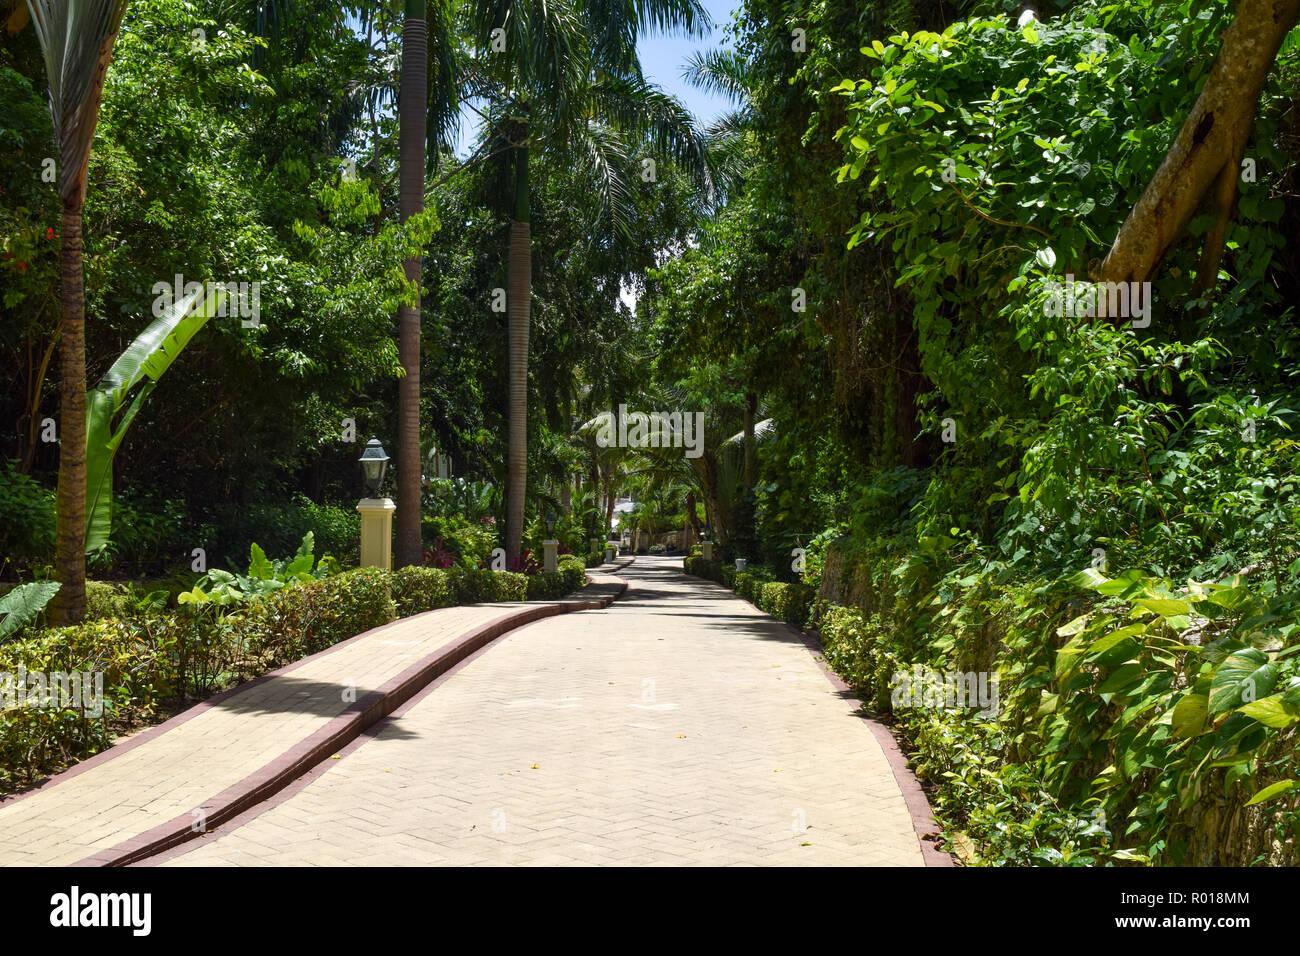 Walk through tropical park - Stock Image